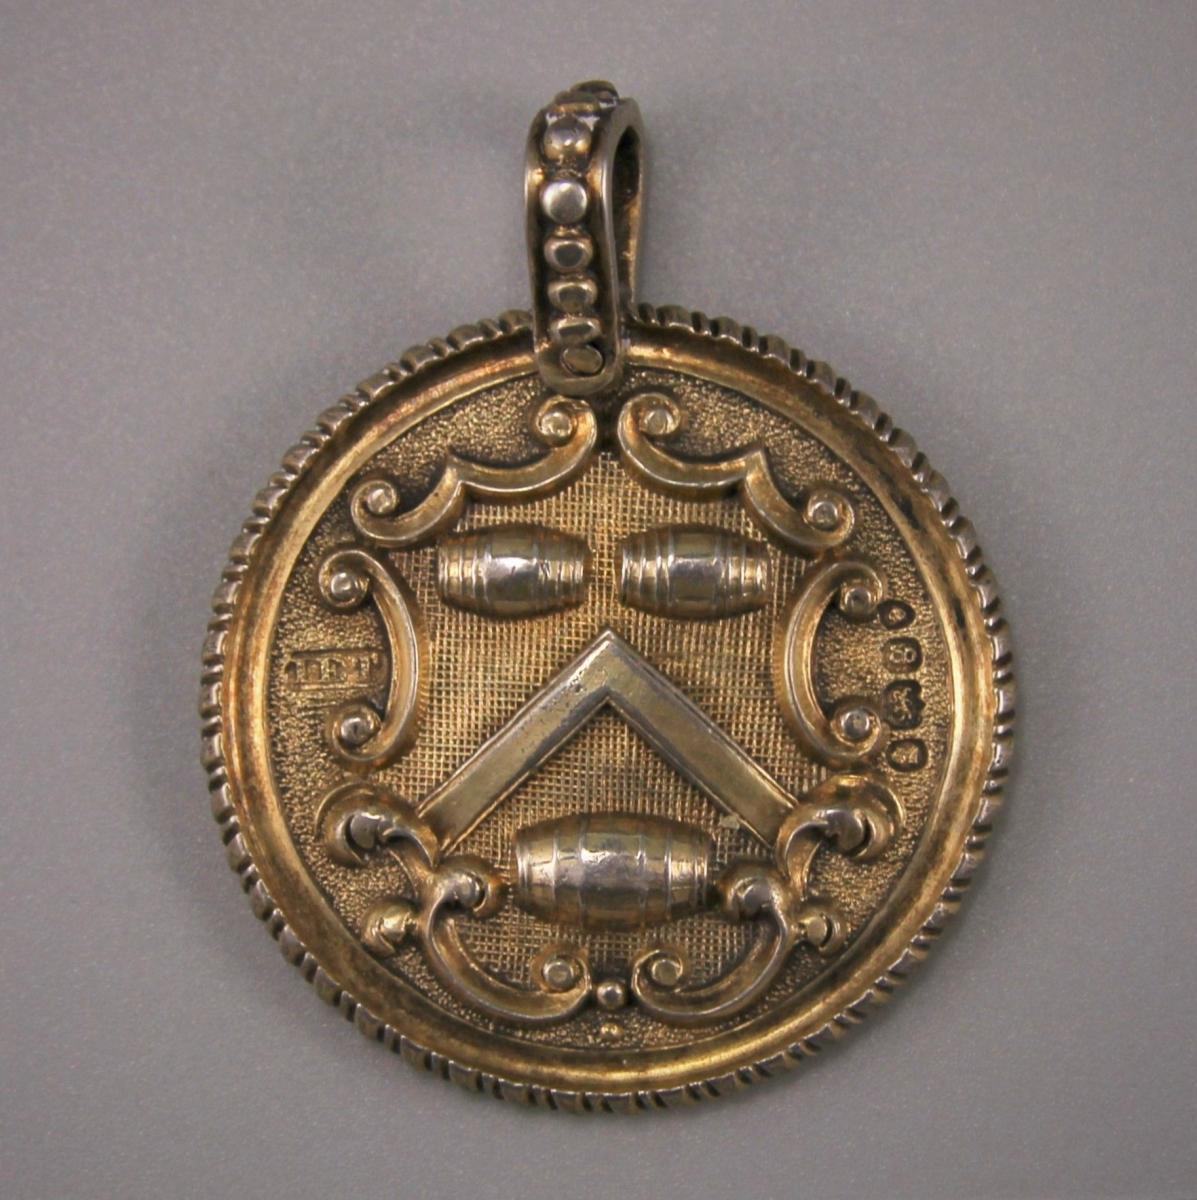 GEORGE IV Vintners' Company Silver Gilt Livery Medal. London 1822